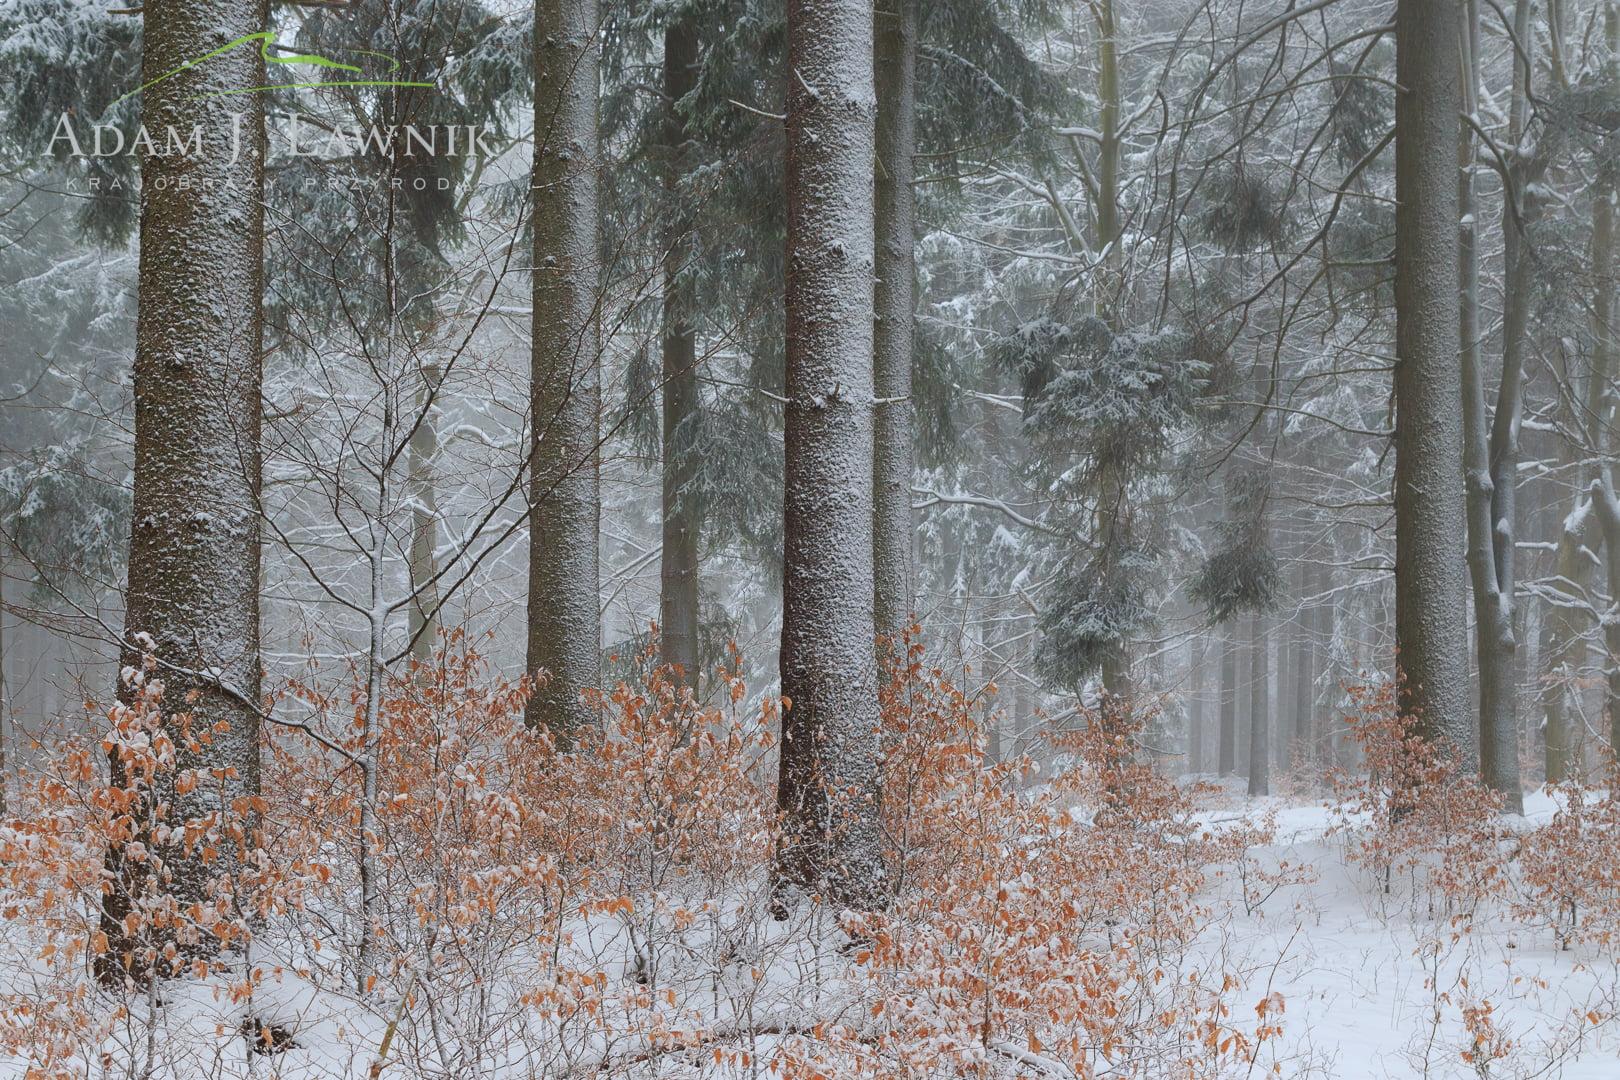 Drzewa oblepione śniegiem